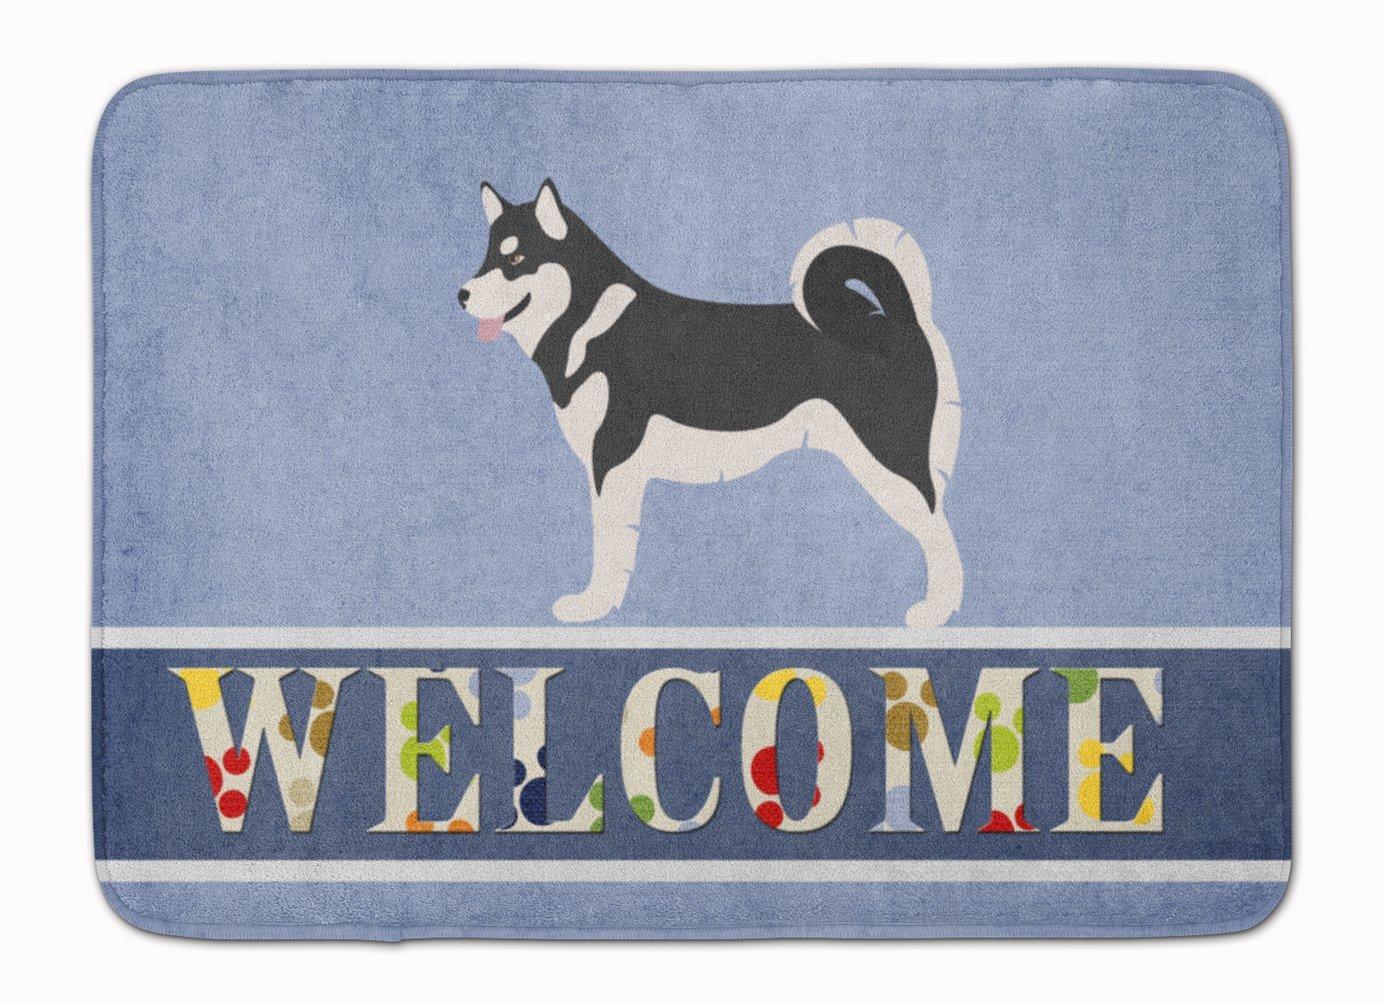 "Caroline's Treasures Alaskan Malamute Welcome Floor Mat, 19"" x 27"", Multicolor"